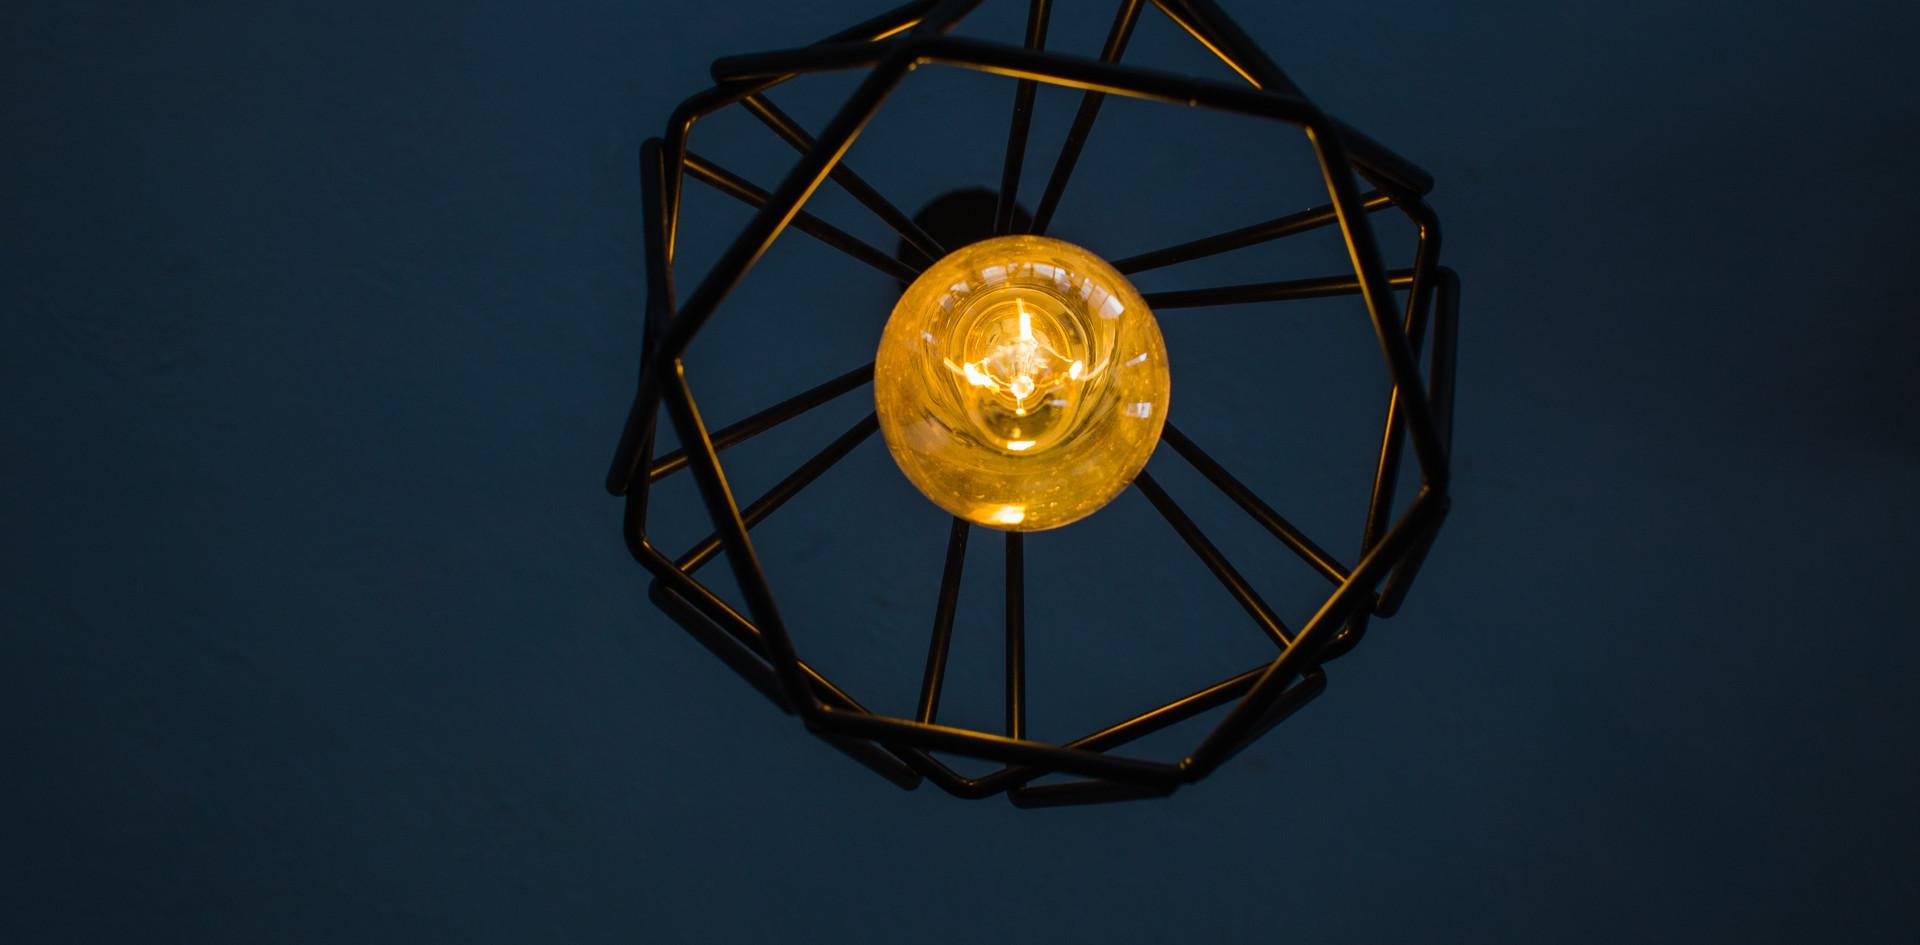 Detalle lámpara.